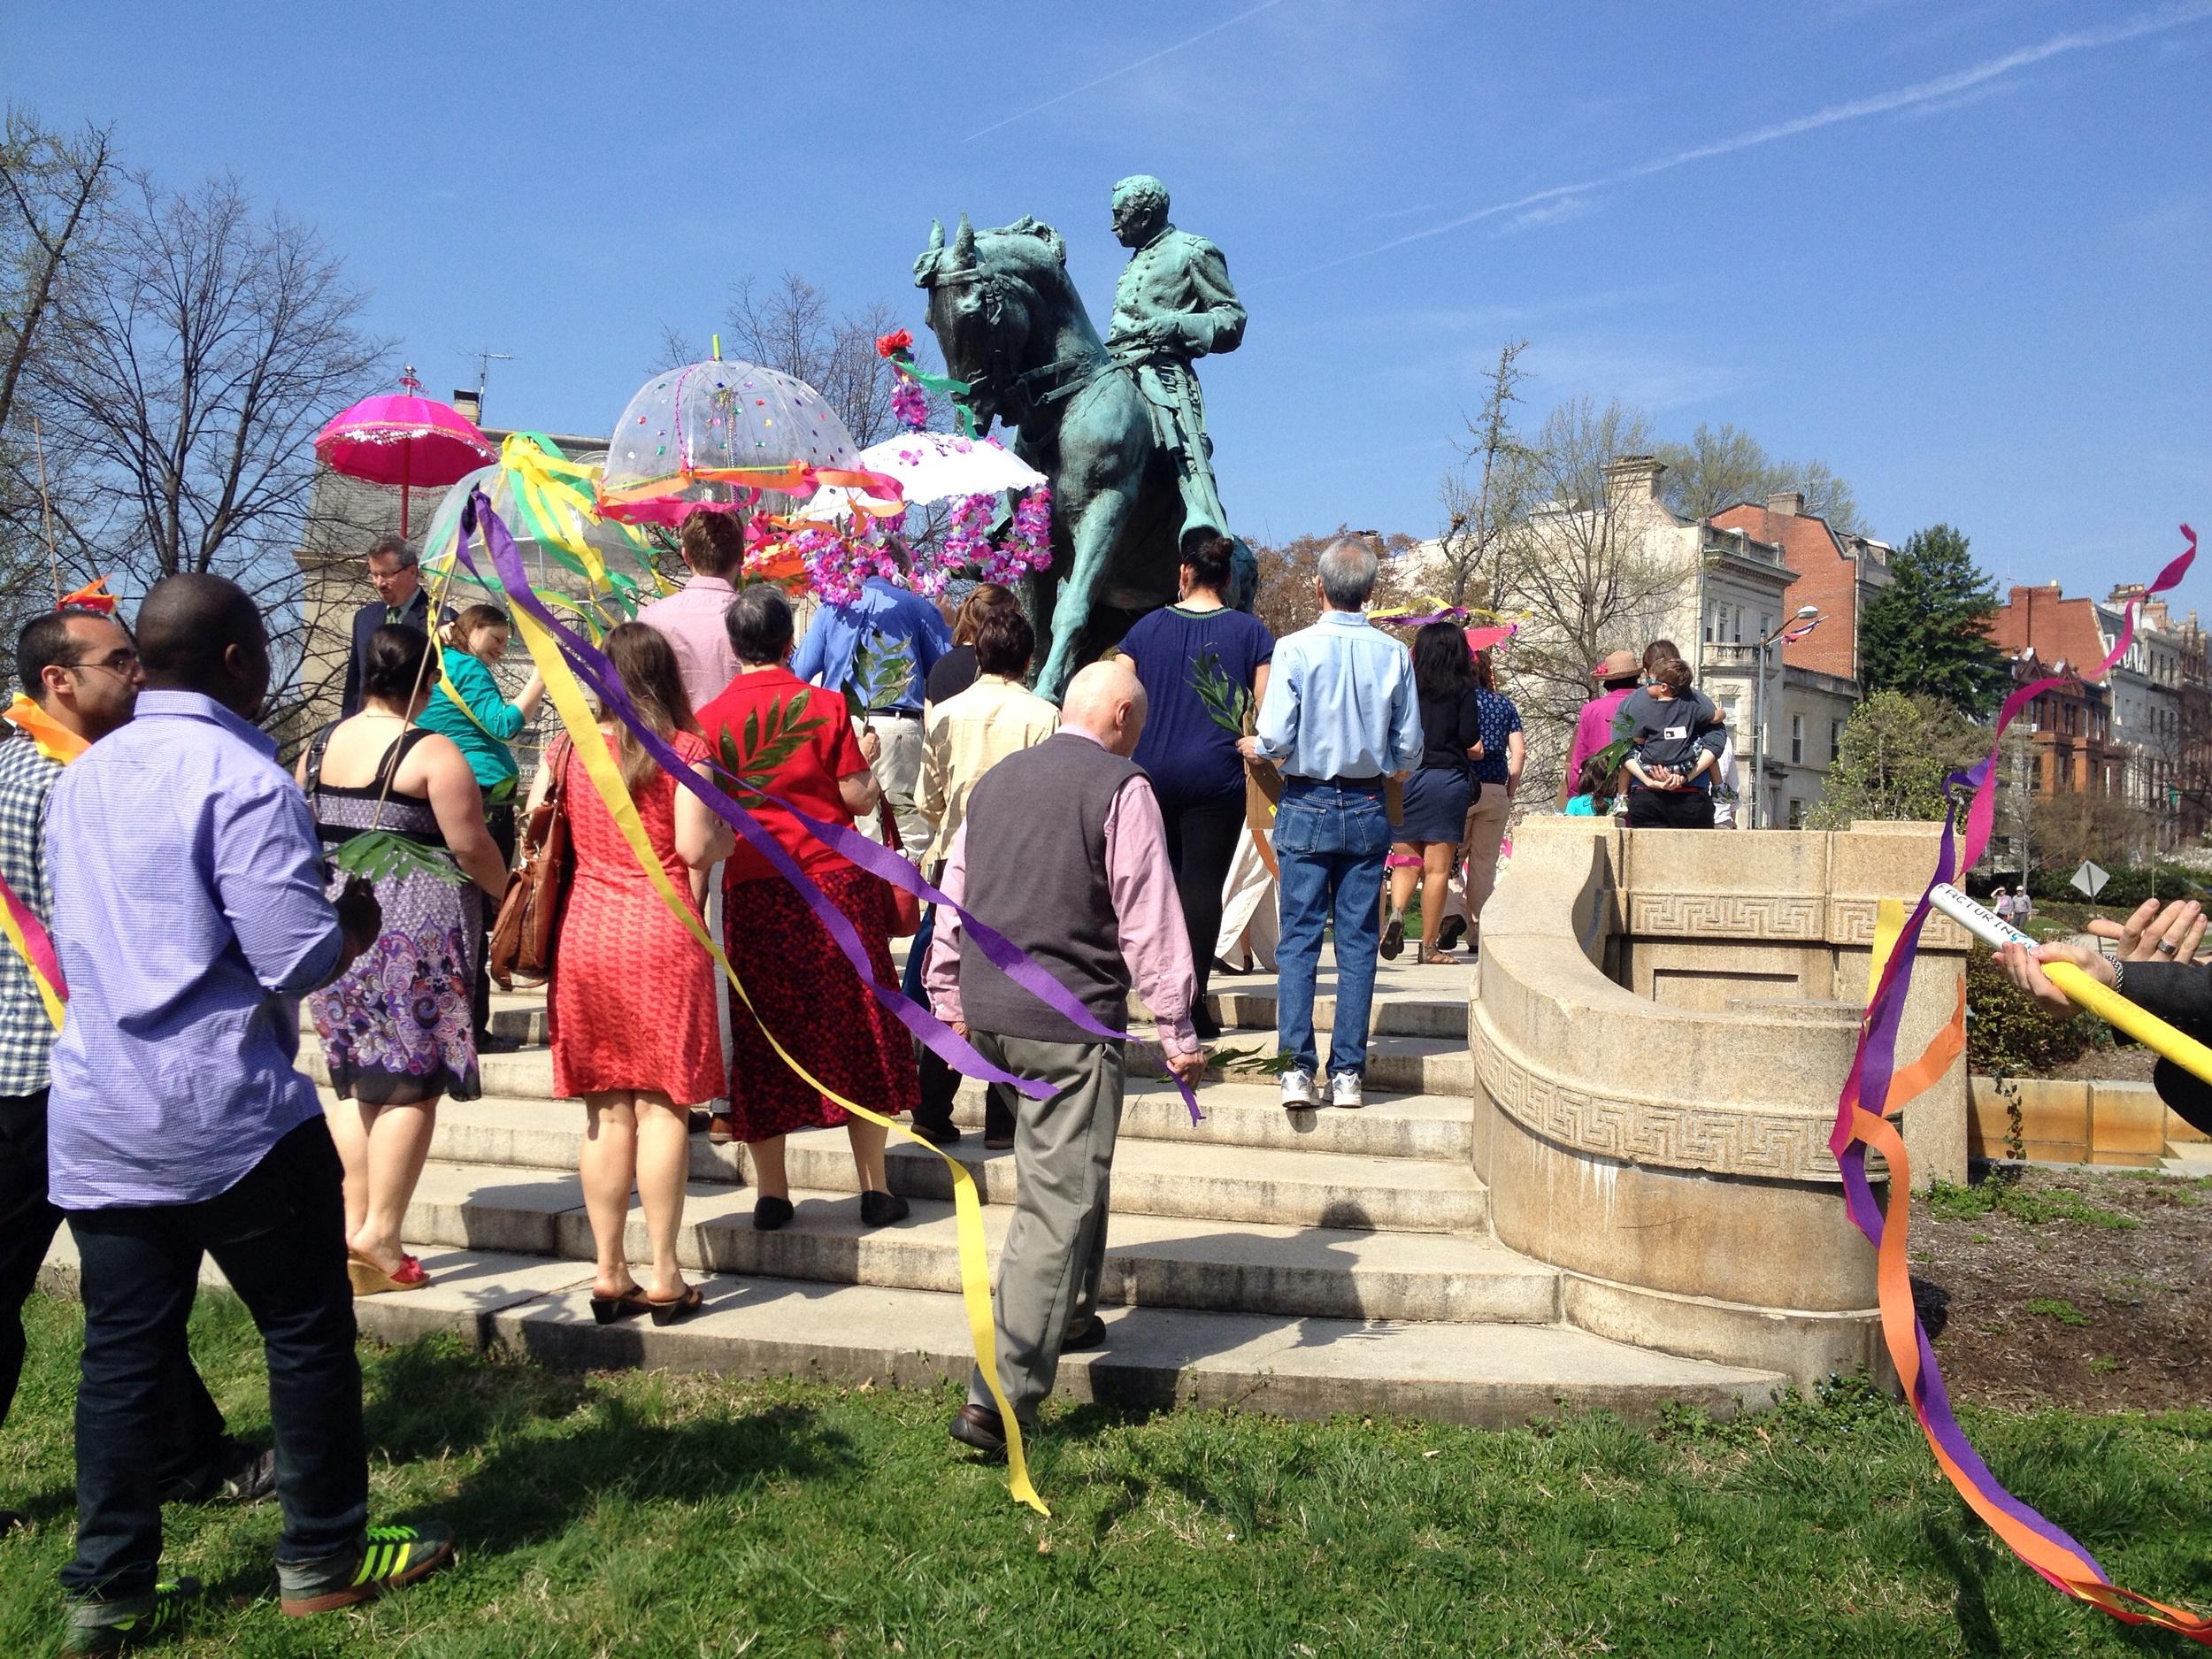 Palm Sunday procession at Church of the Pilgrims, Washington, DC